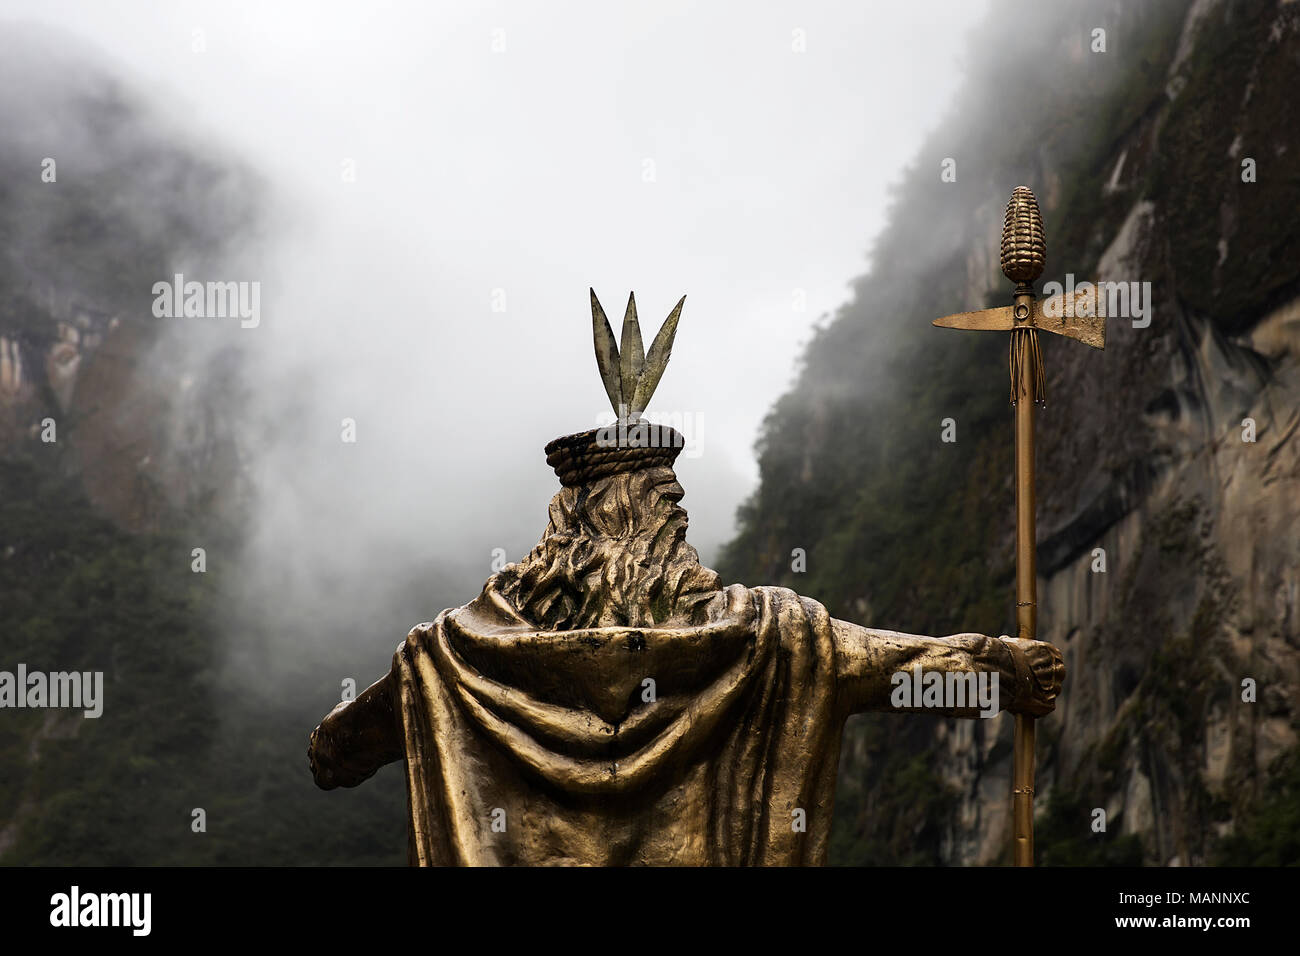 Statue of Pachacuti in Aguas Calientes, Peru. Pachacuti was the 9th Sapa Inca of the Kingdom of Cusco. - Stock Image